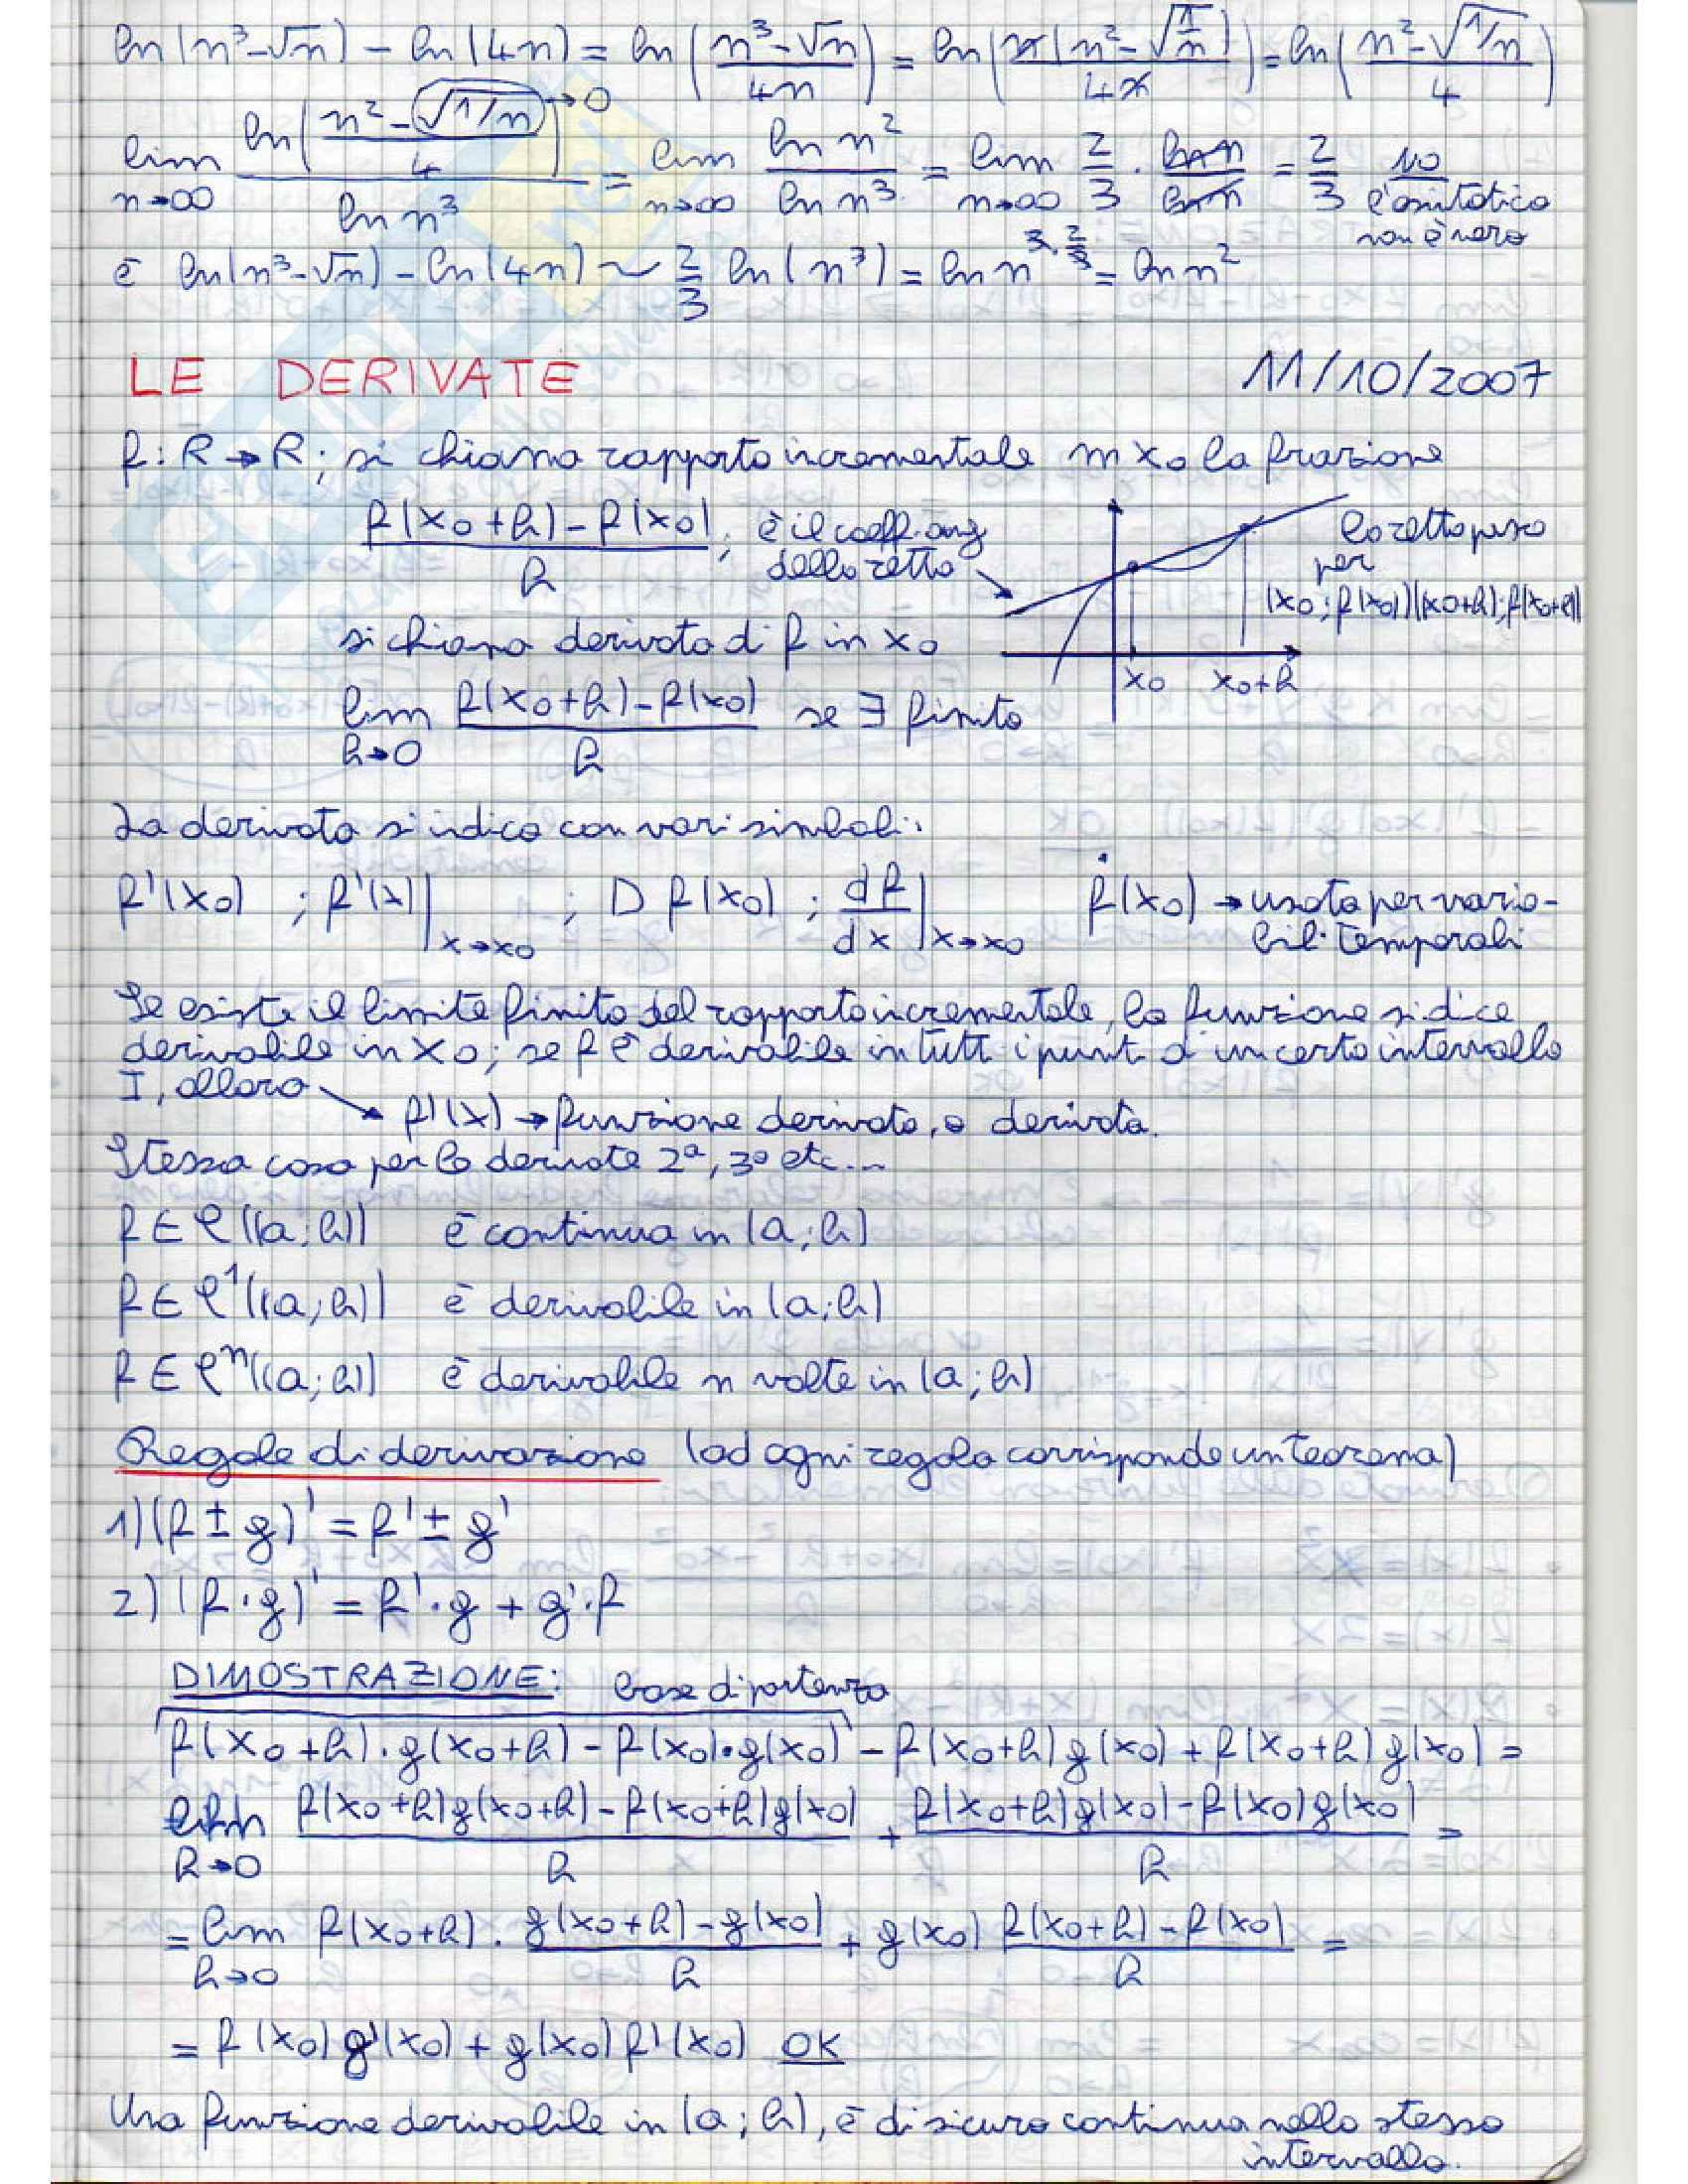 Analisi e geometria 1 - appunti Pag. 41